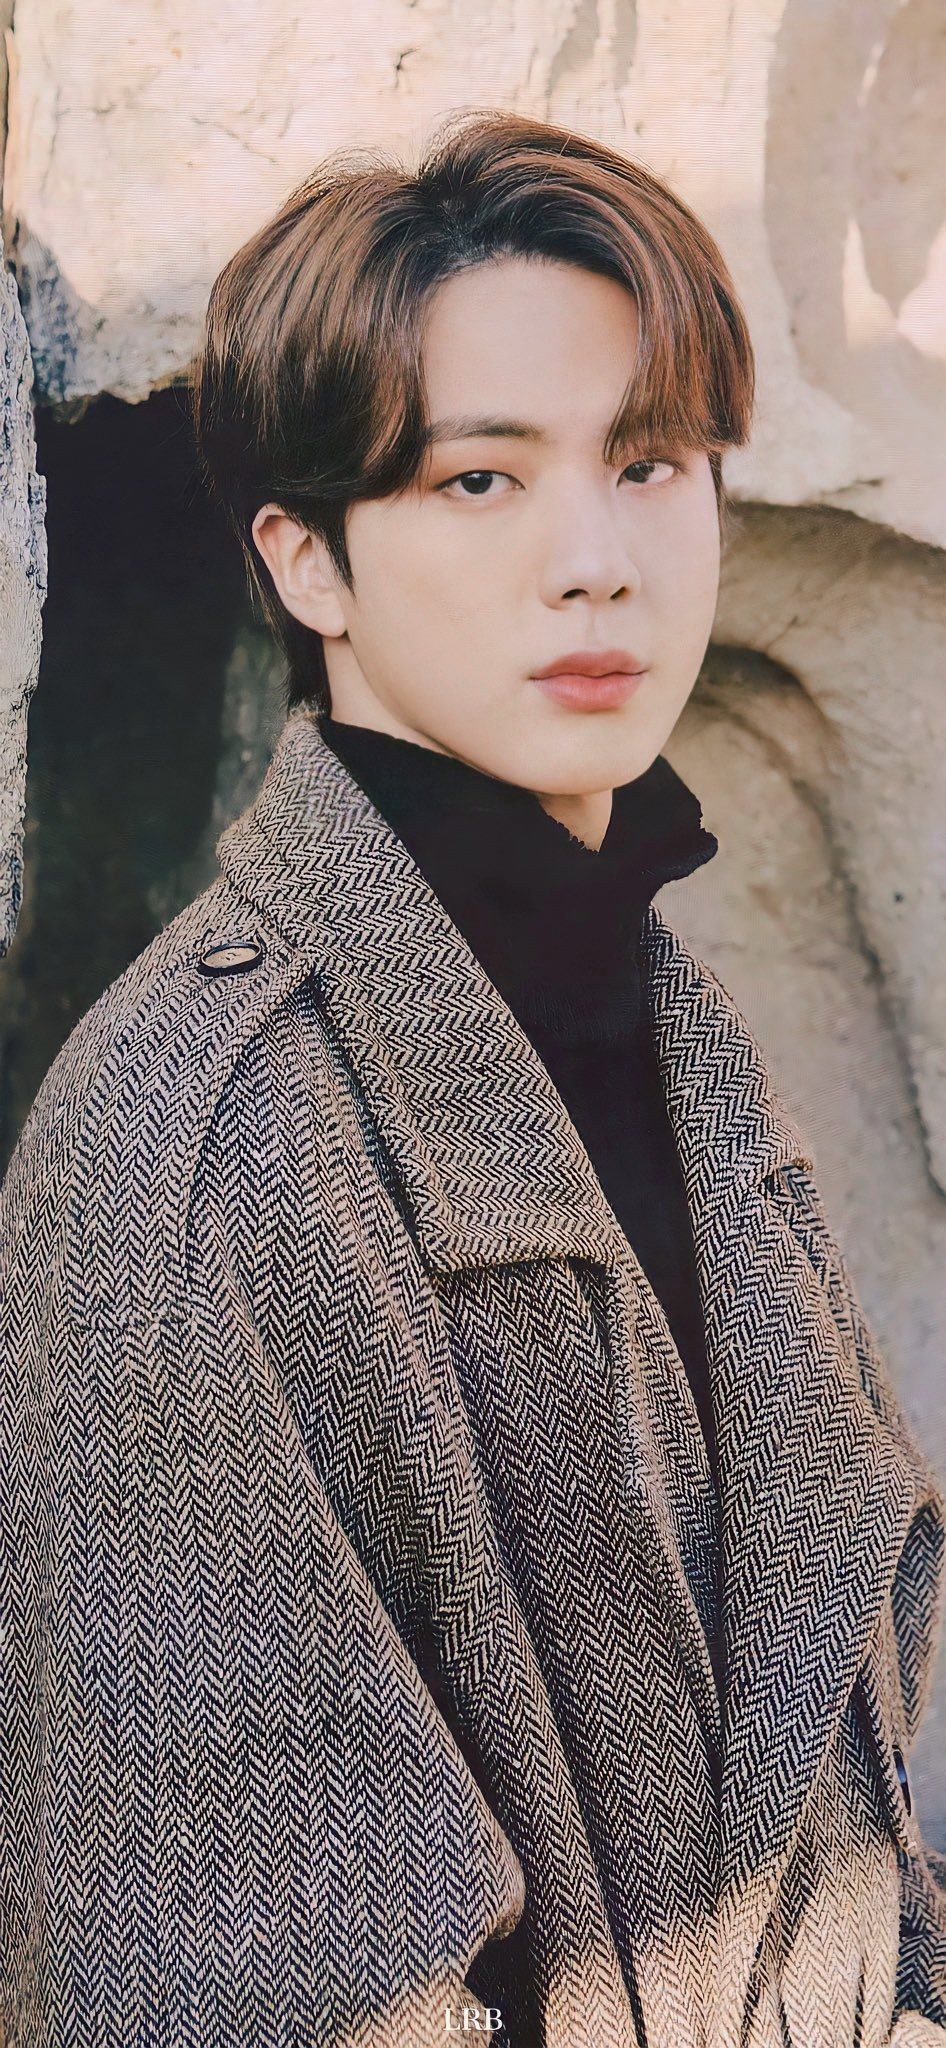 Bts jin wallpaper hd 2021